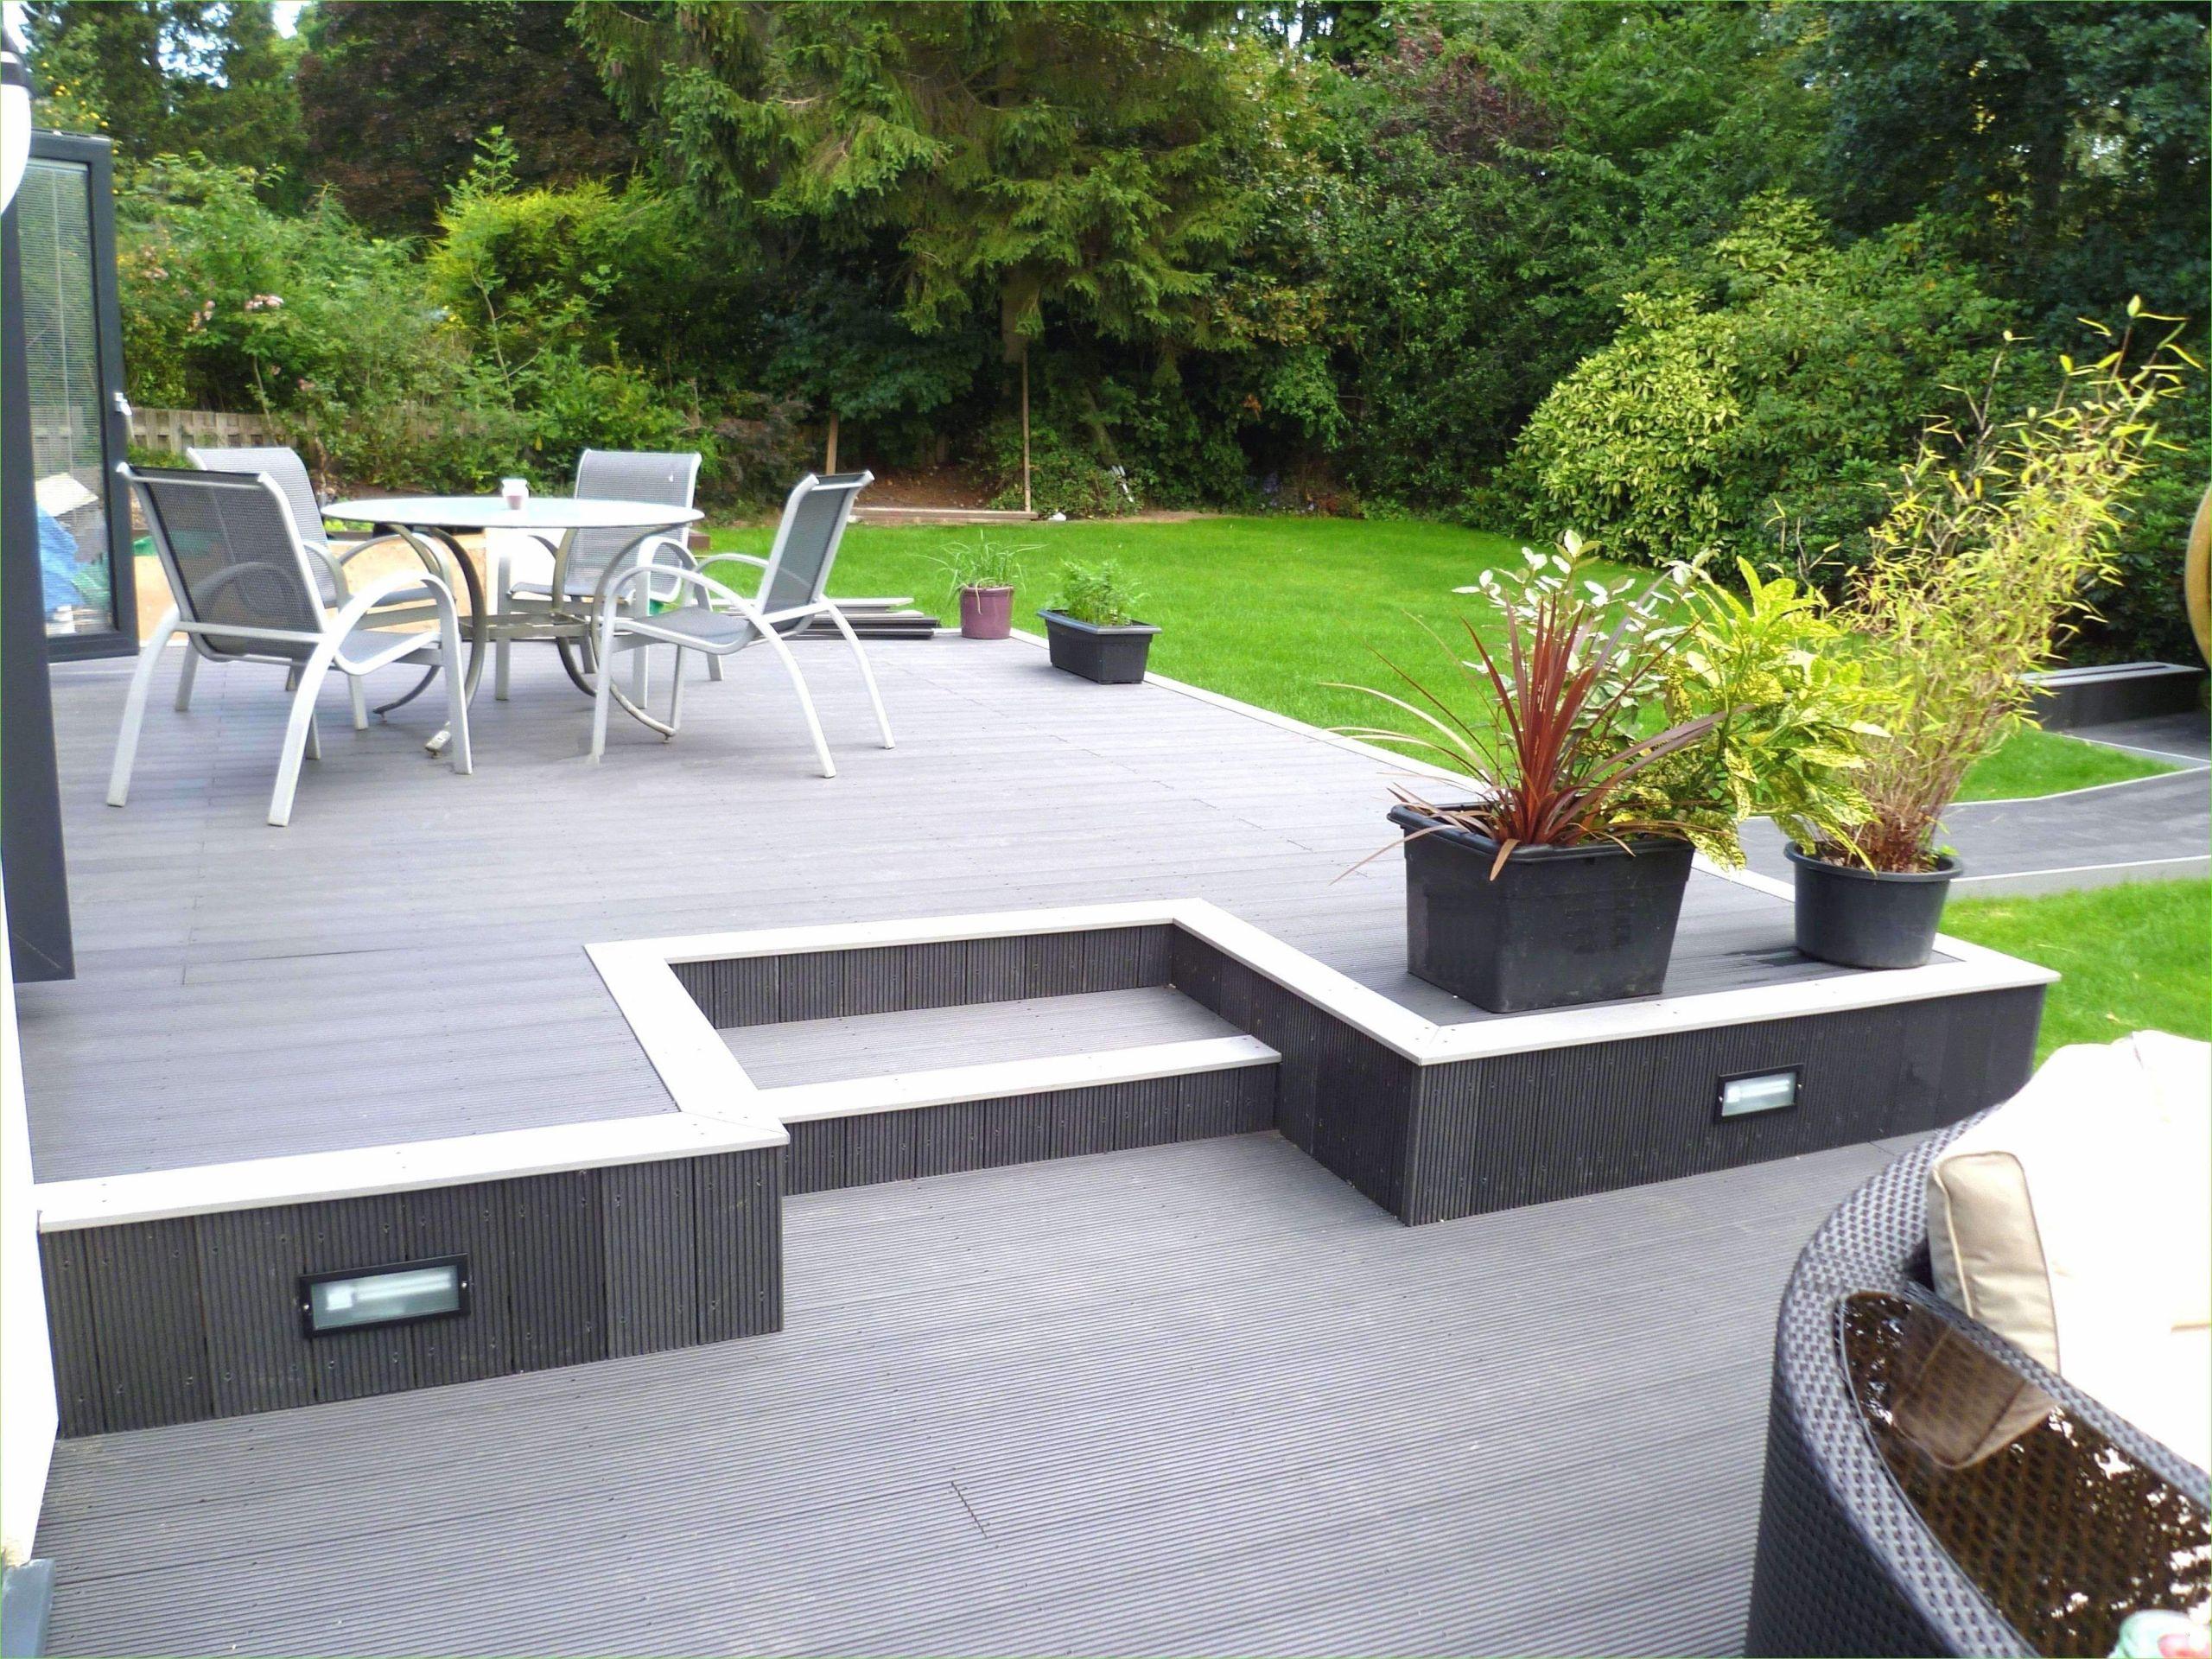 siena garden gartenmobel dalepeck haus pc7o4b6e of auflagen fur relaxsessel